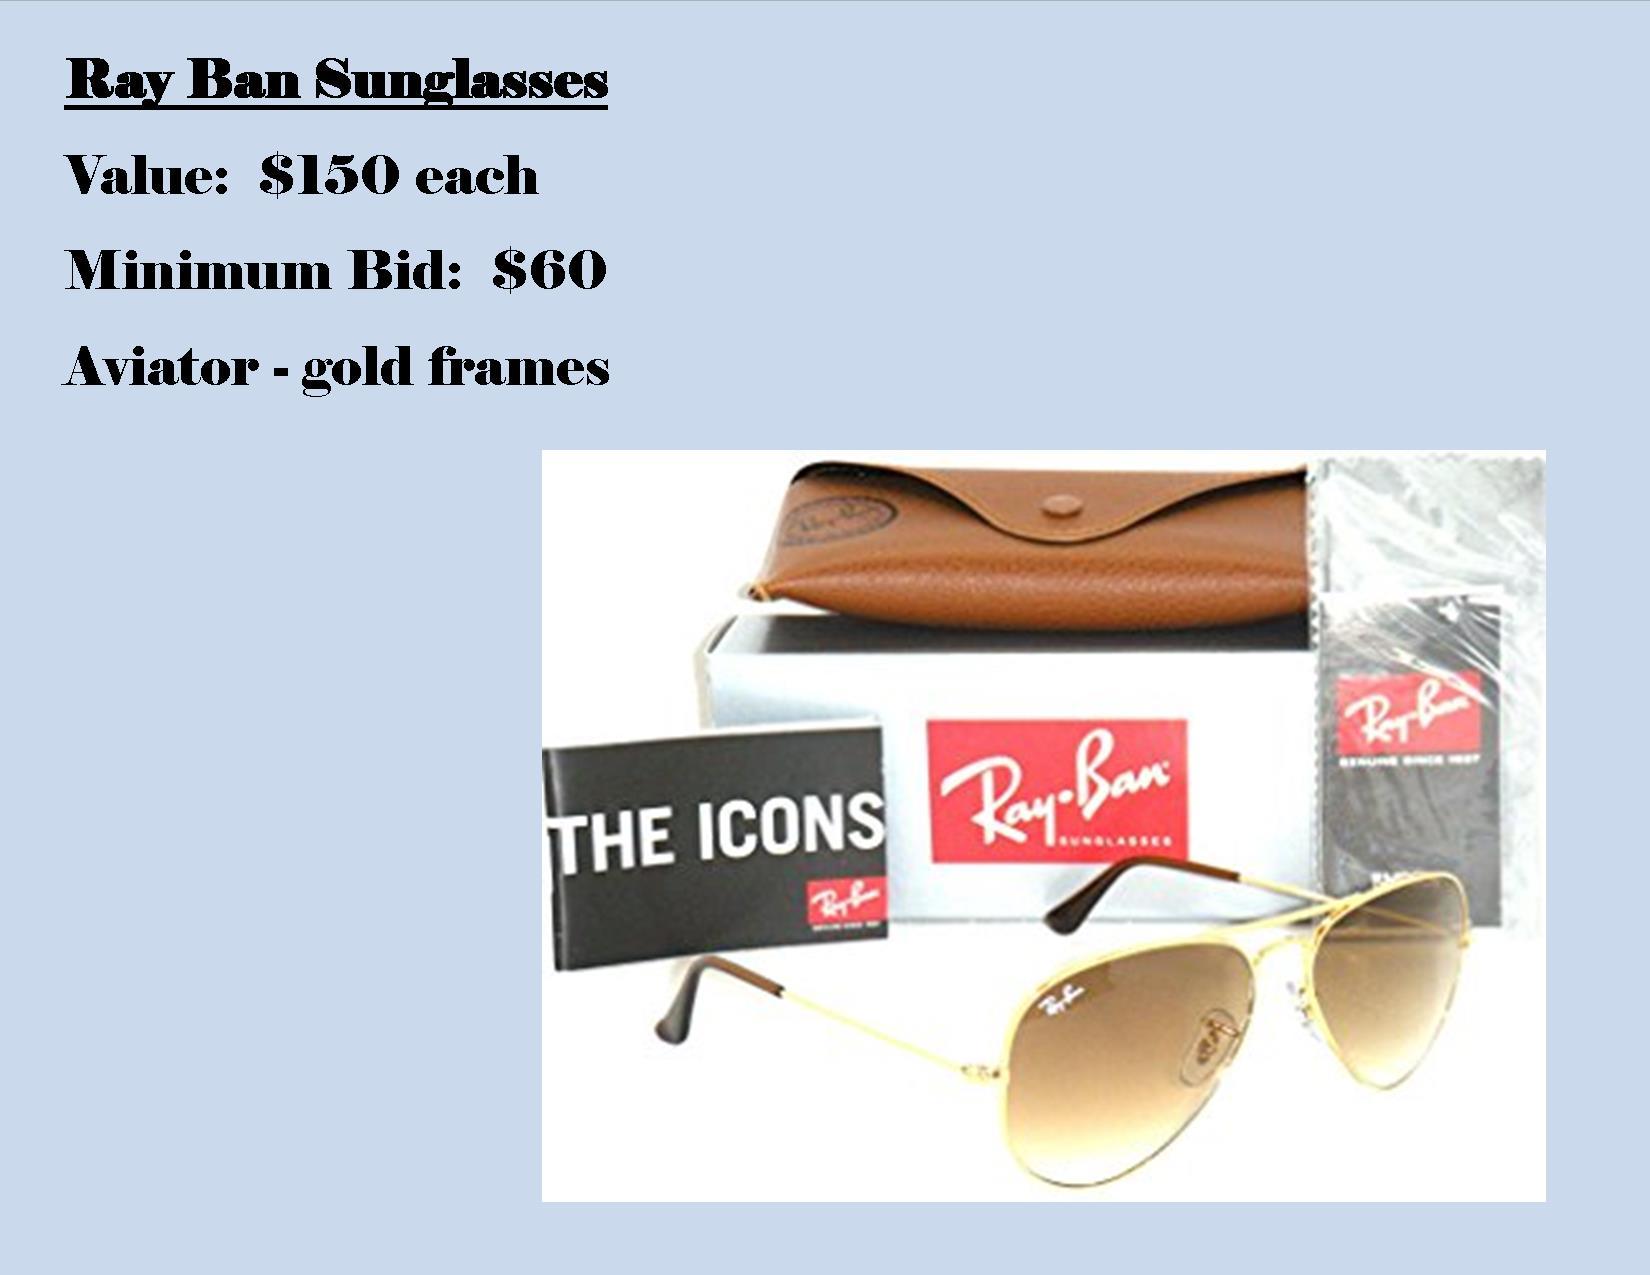 ray ban sunglasses.jpg